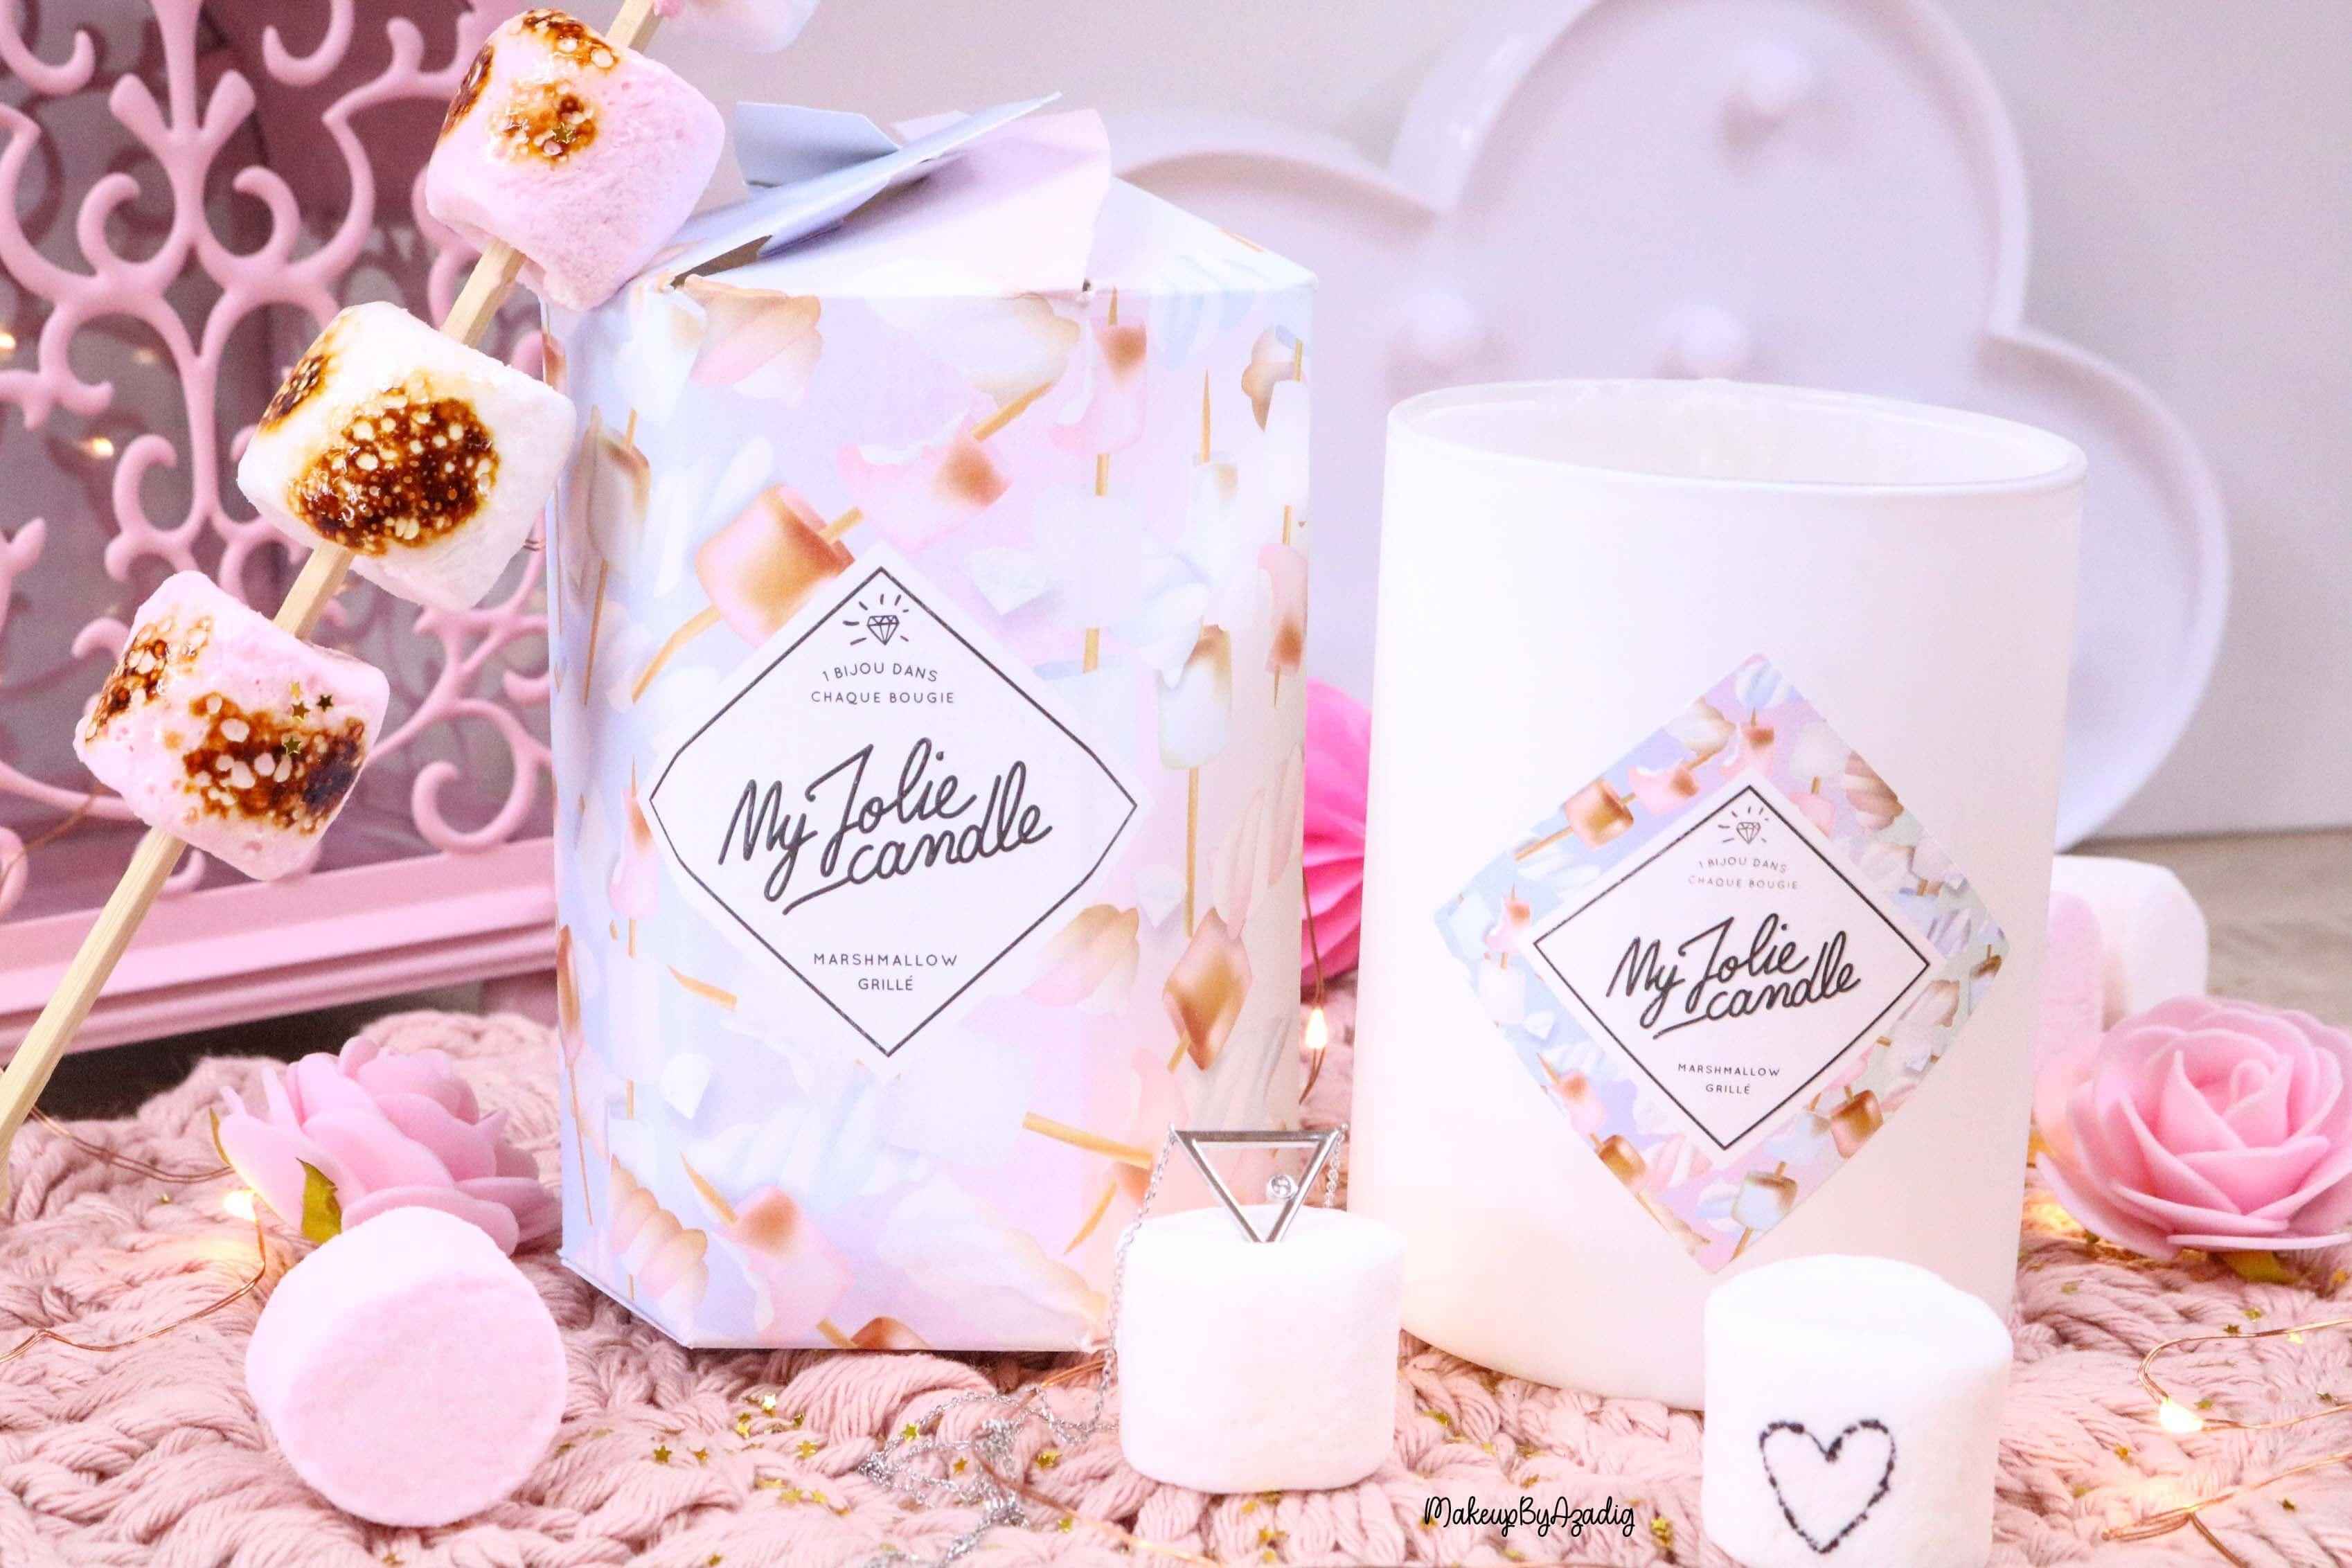 my-jolie-candle-bougie-bijou-swarovski-argent-cadeau-maman-mamie-femme-makeupbyazadig-collector-chamallow-avis-prix-promo